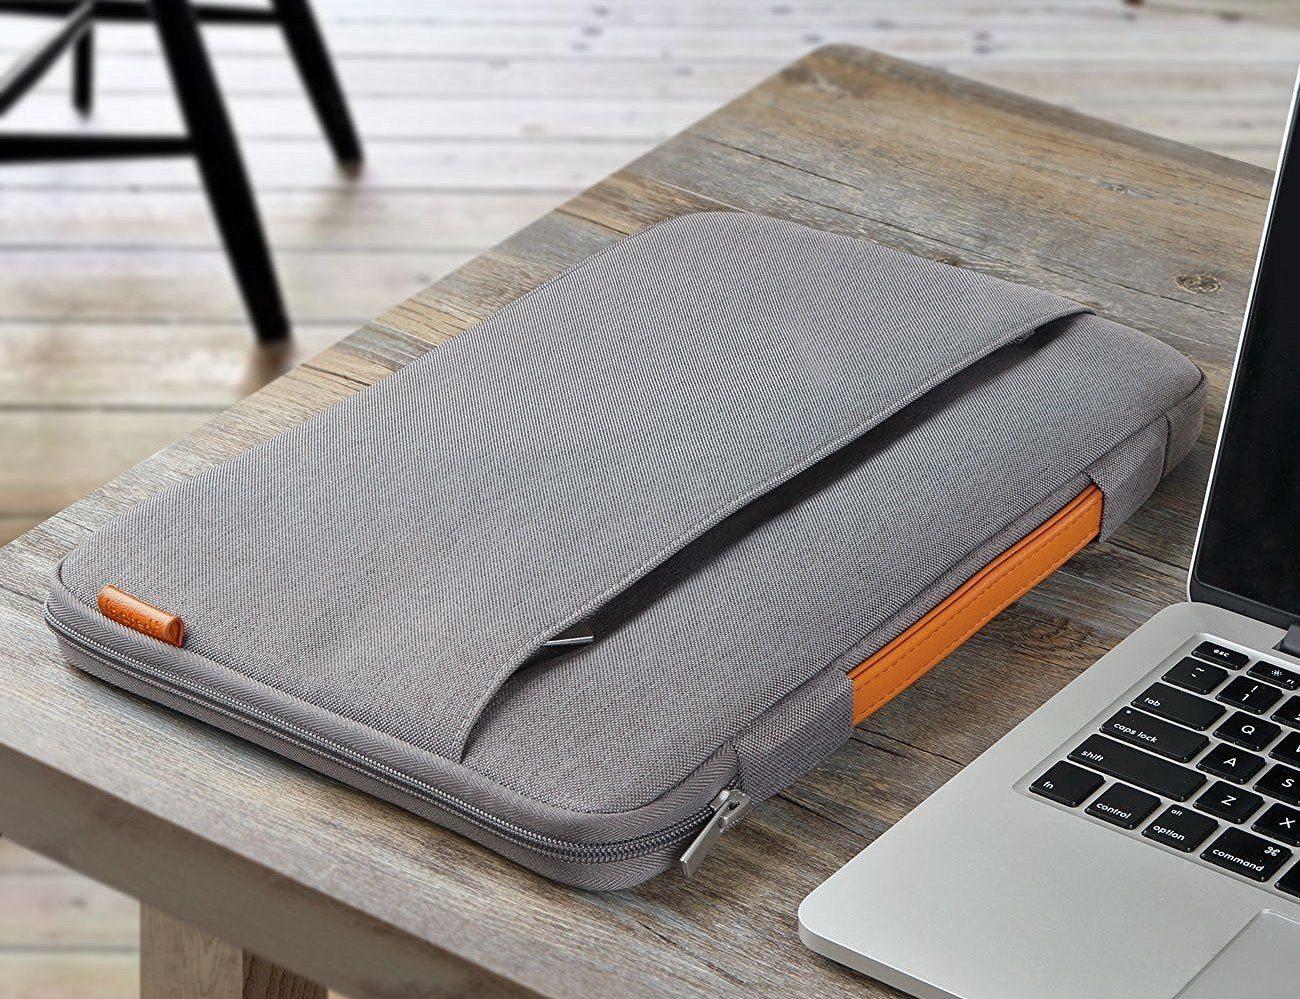 MacBook+Protector+Sleeve